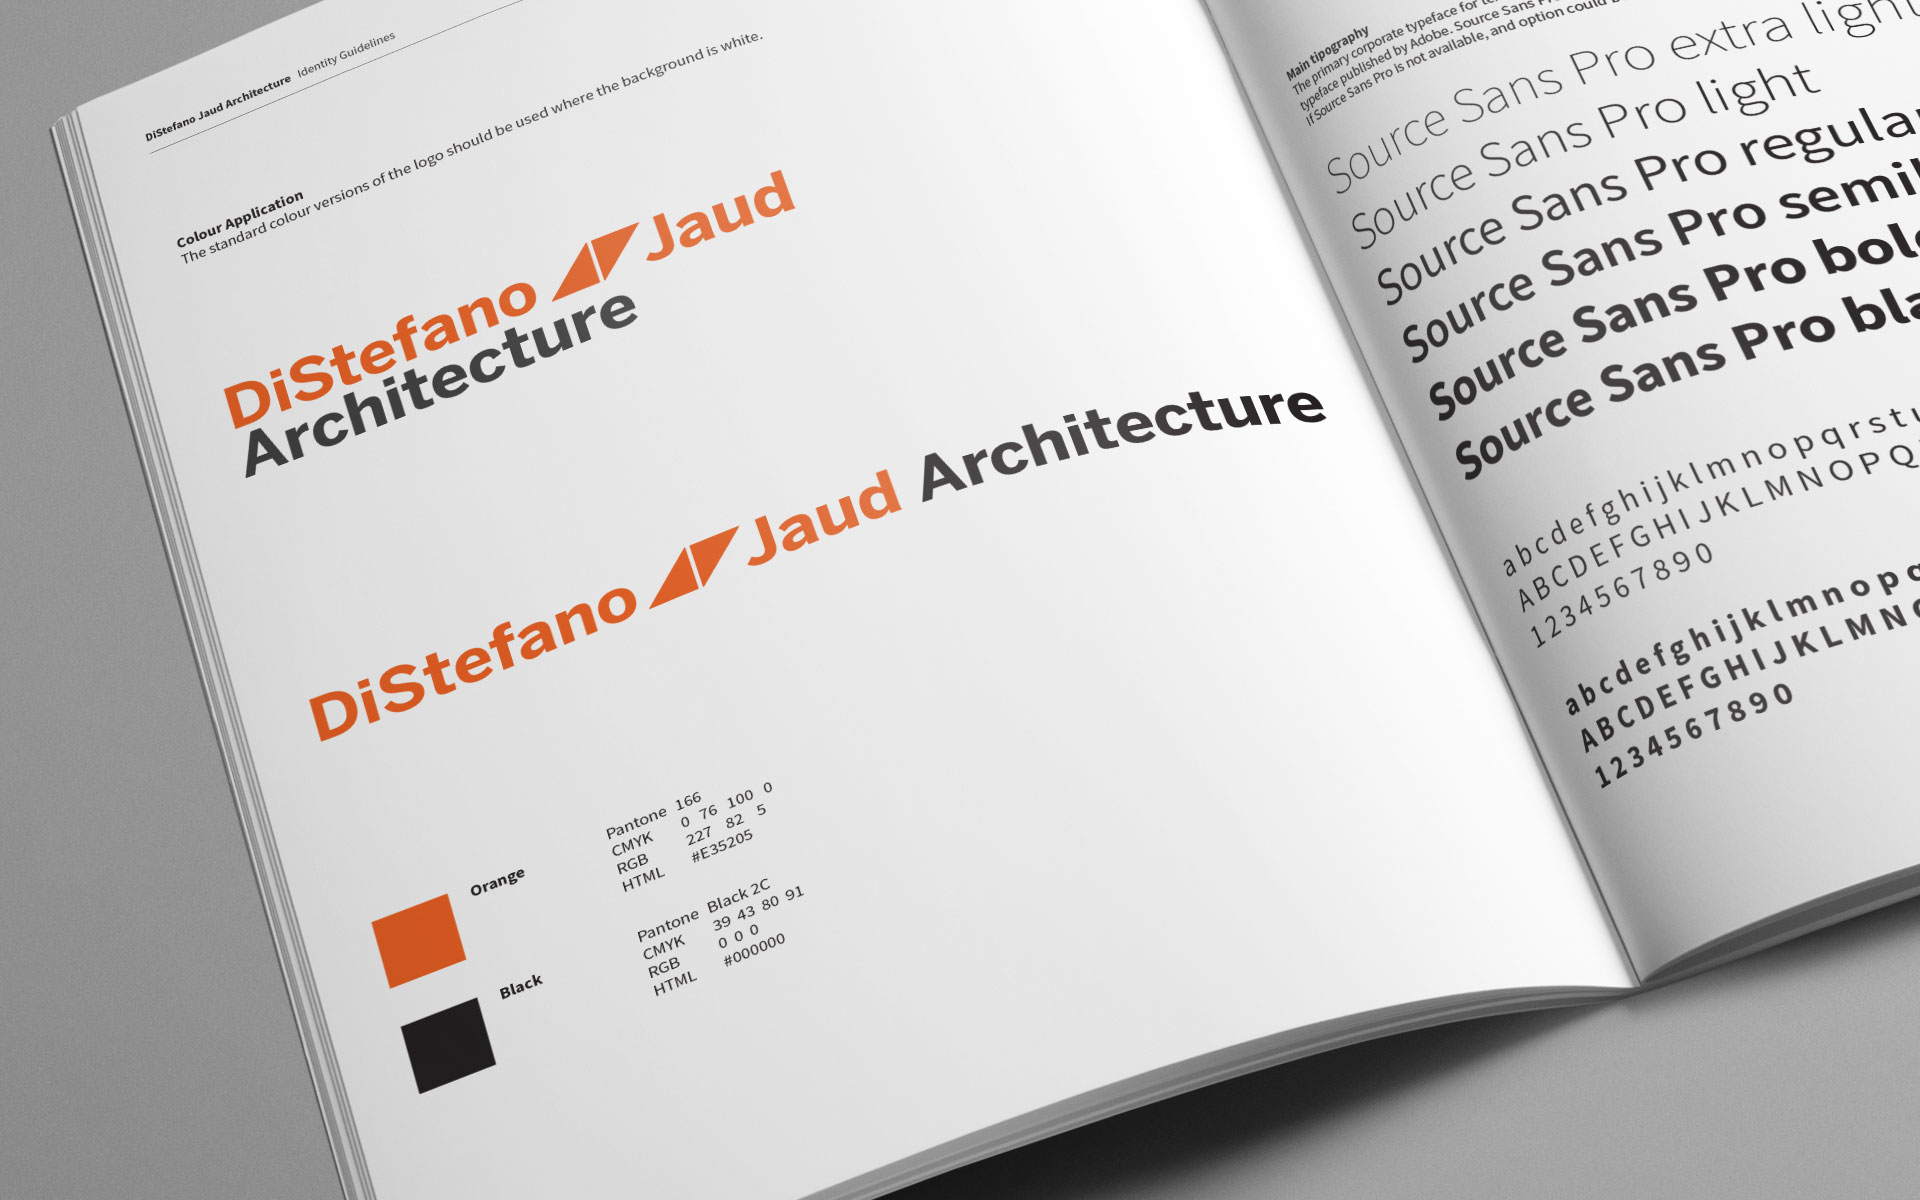 distefano-jaud-architcture-branding-manual